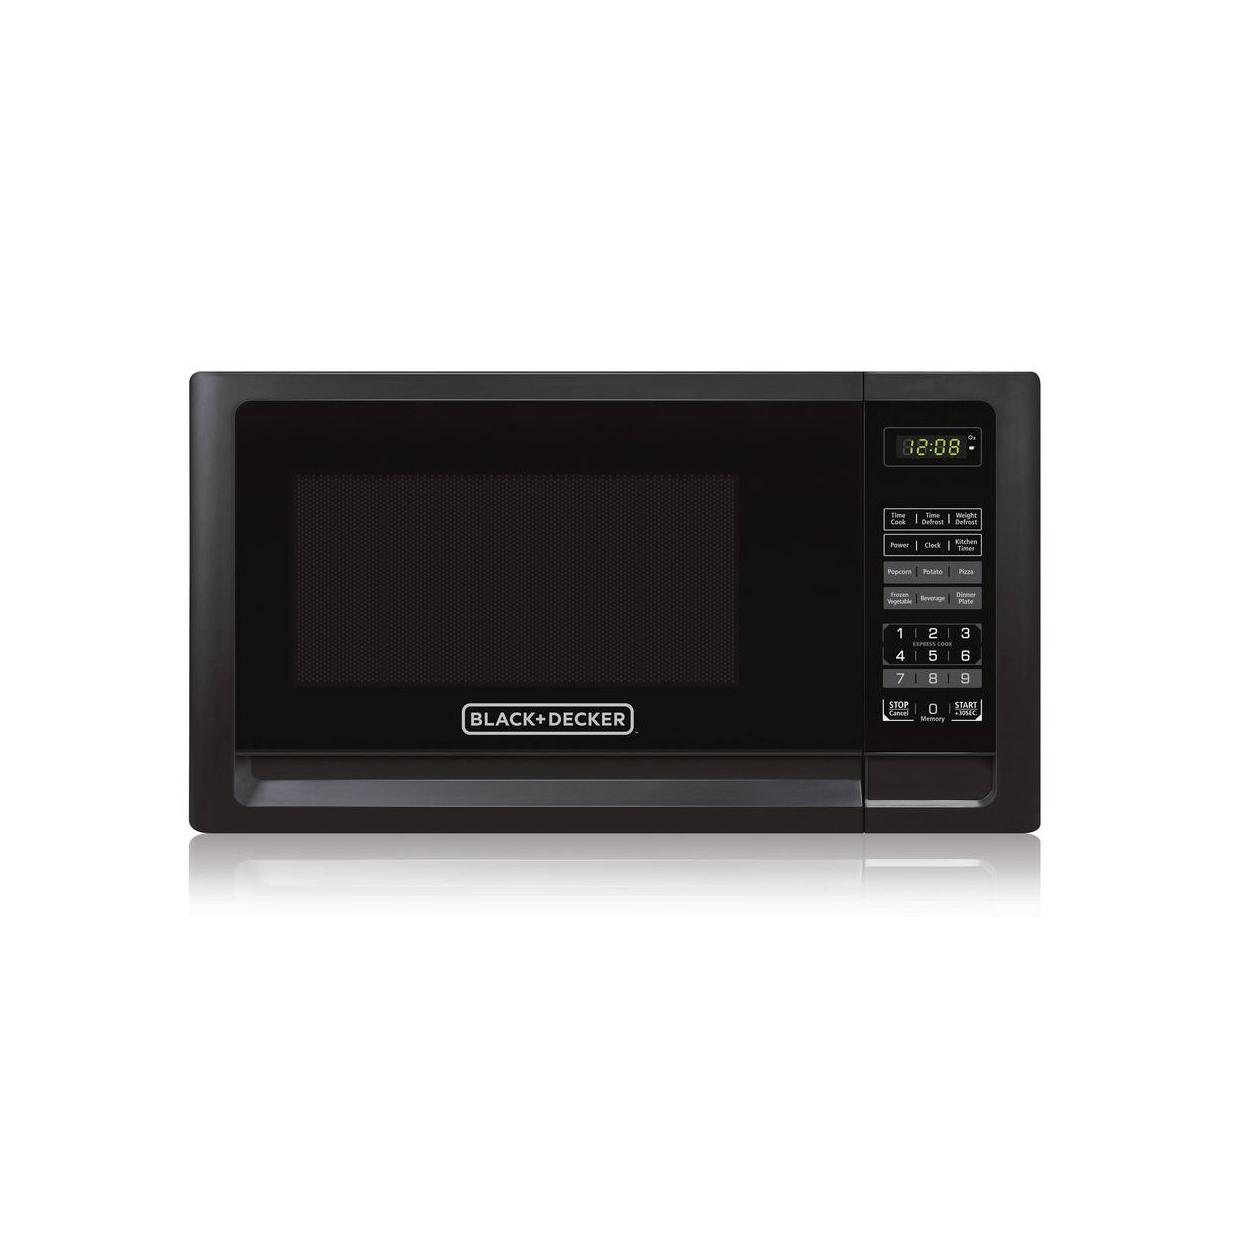 black decker 1 1 microwave oven